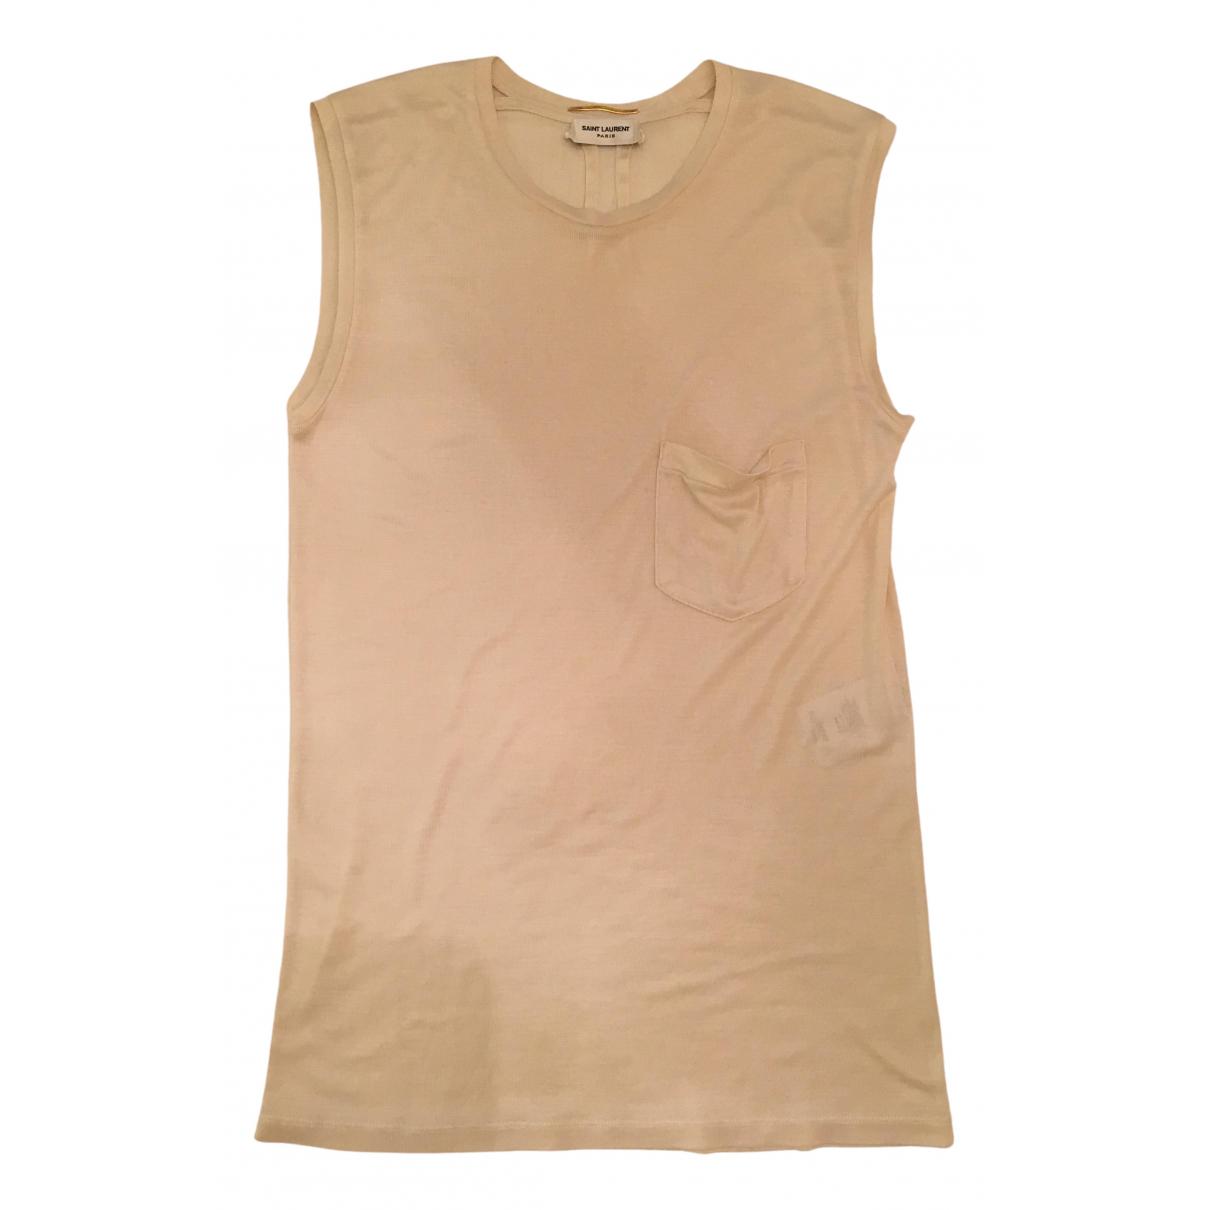 Camiseta sin mangas de Seda Saint Laurent